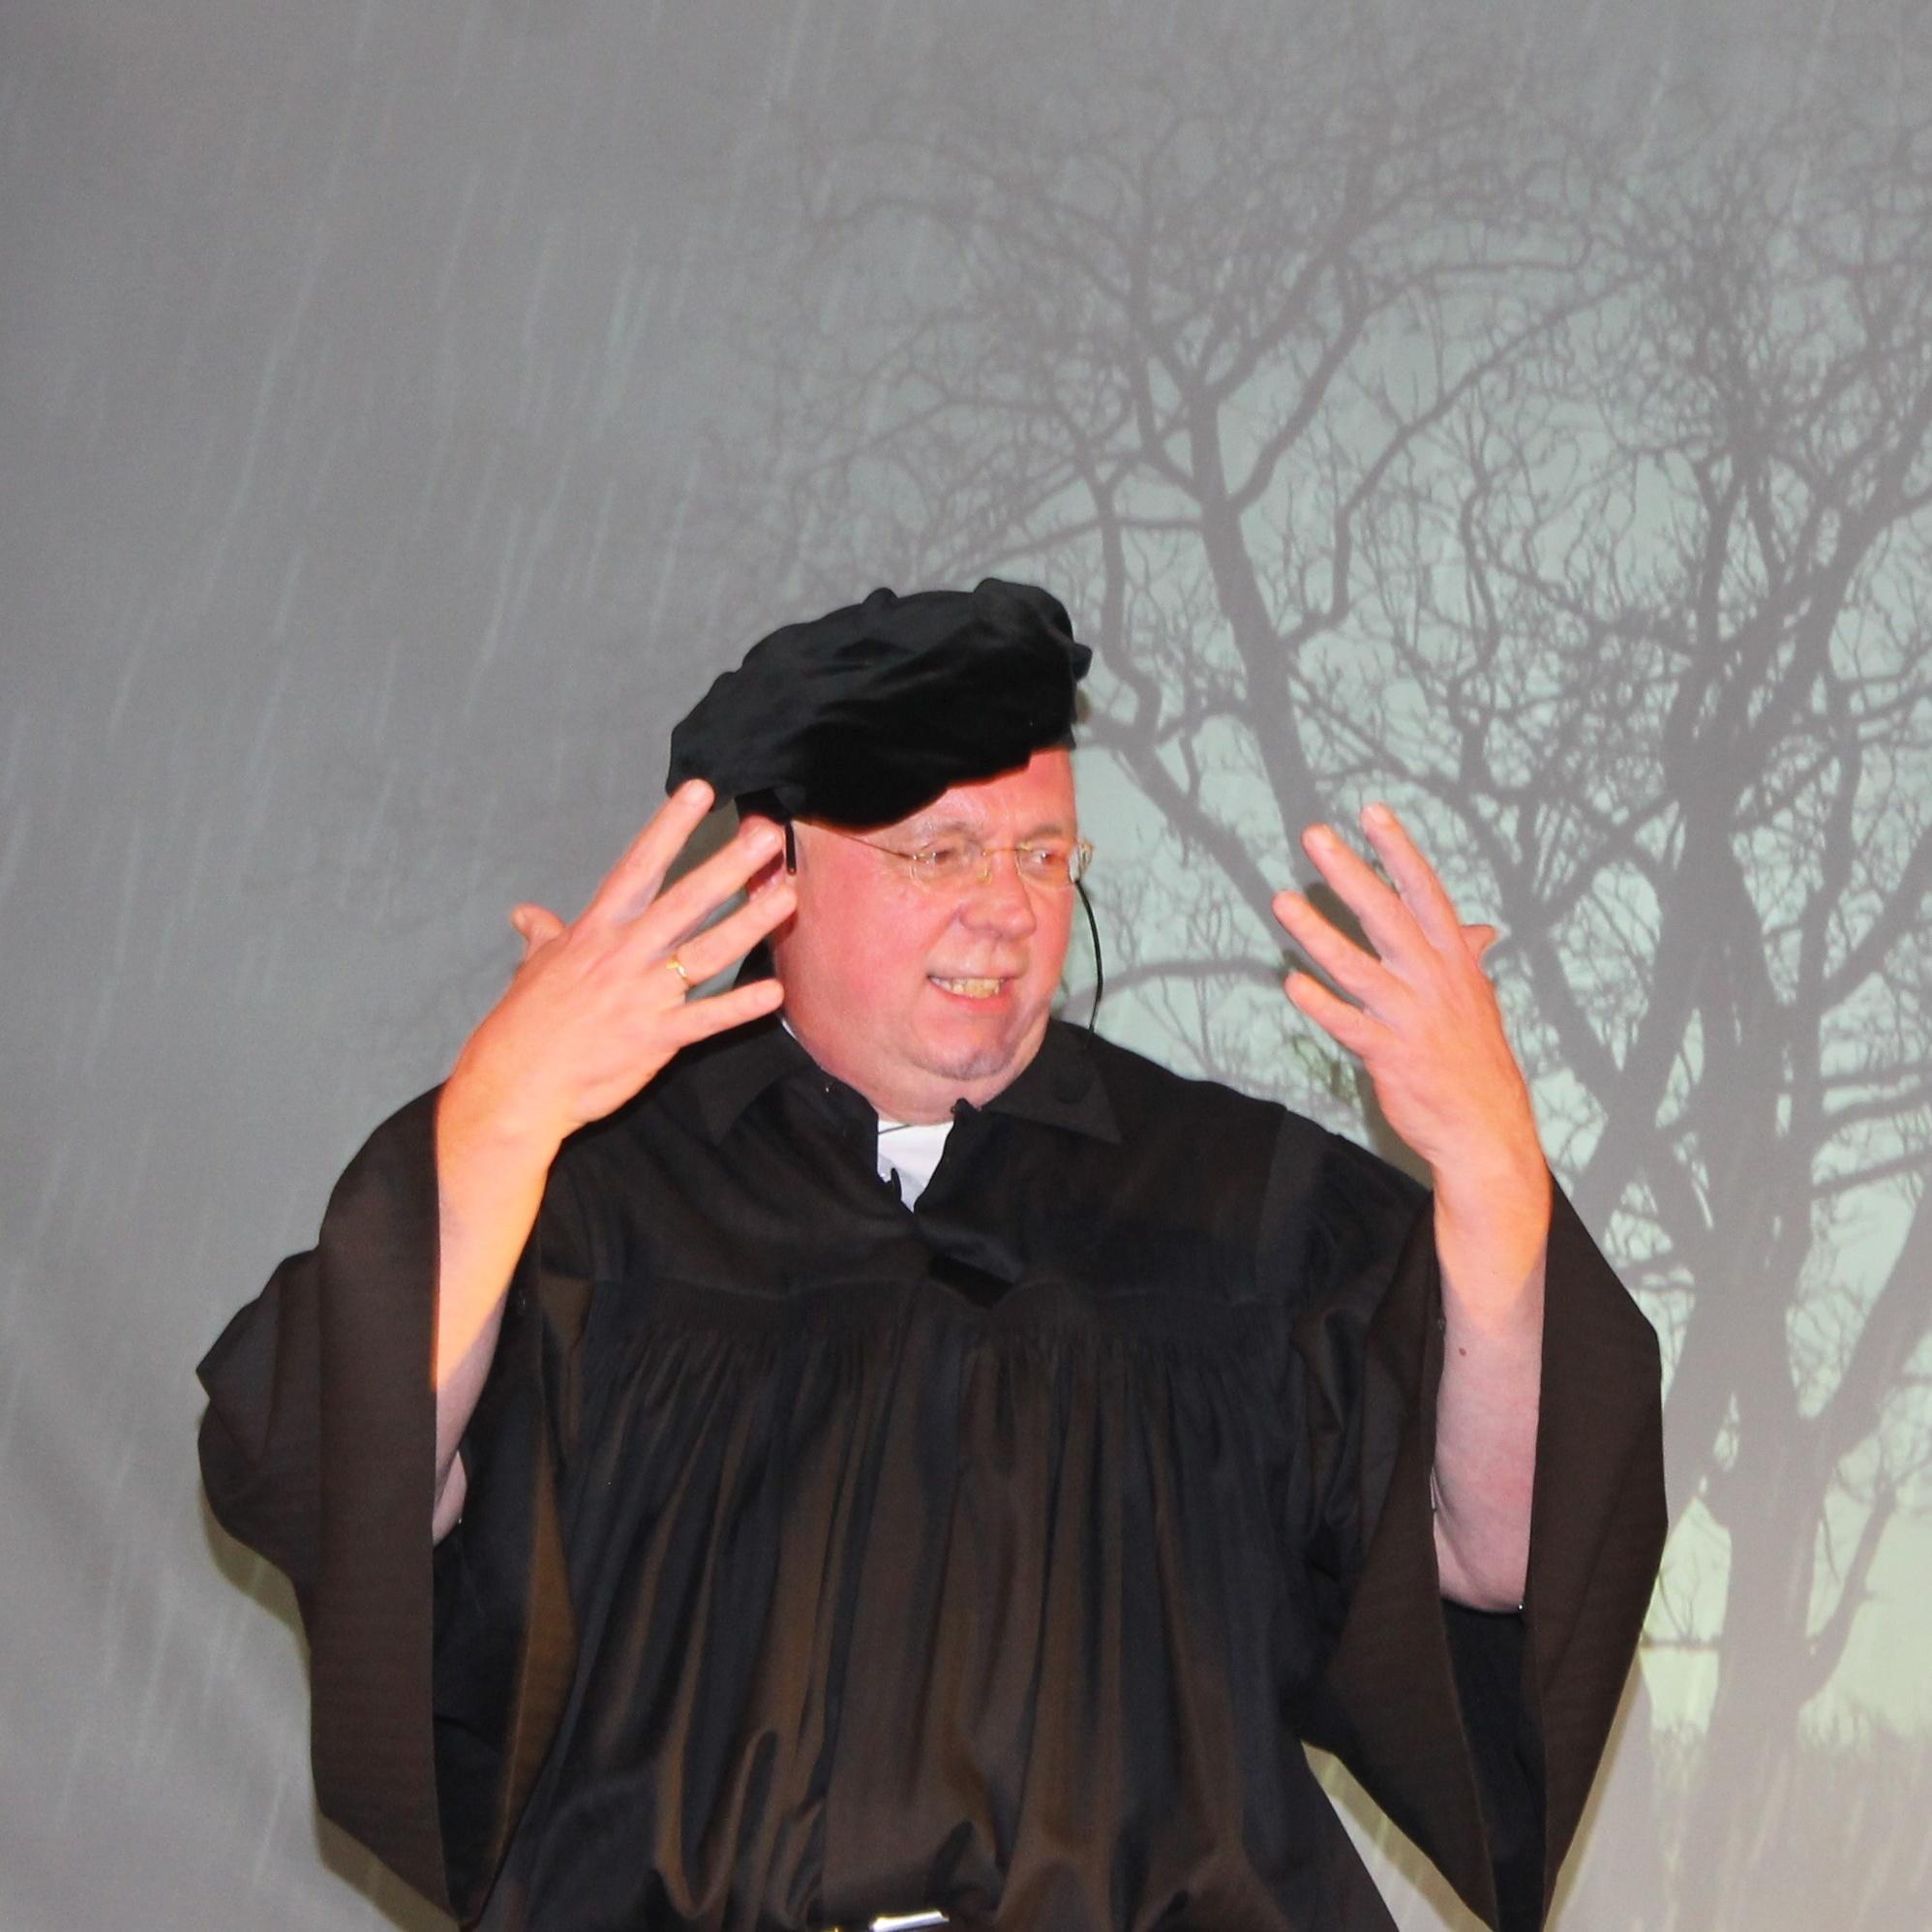 "Musical 700 Zuschauer sehen Luthers Leben ""Großer Moment in der Weltgeschichte"""